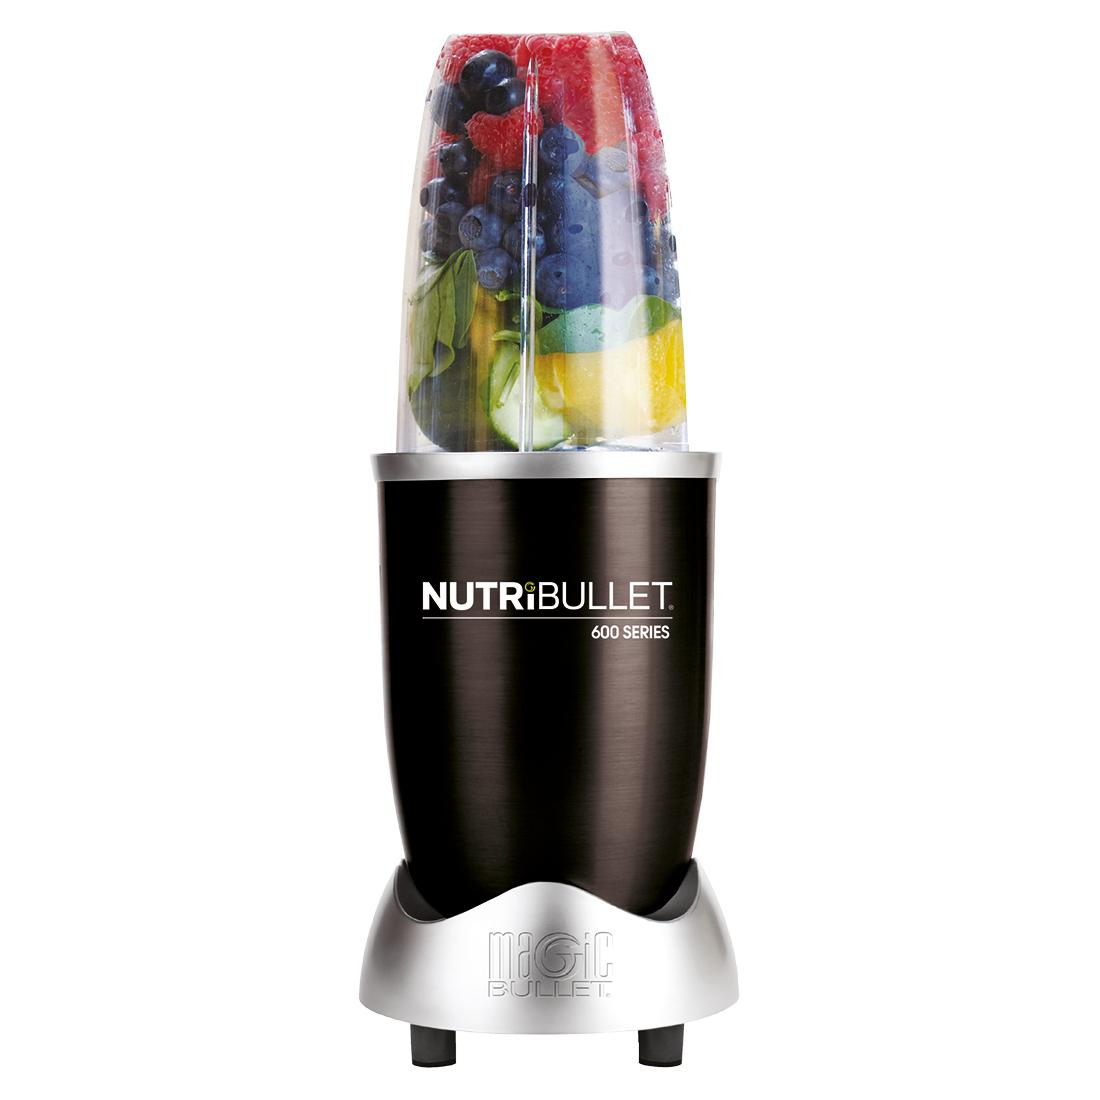 An image of Nutribullet 12pc - Black